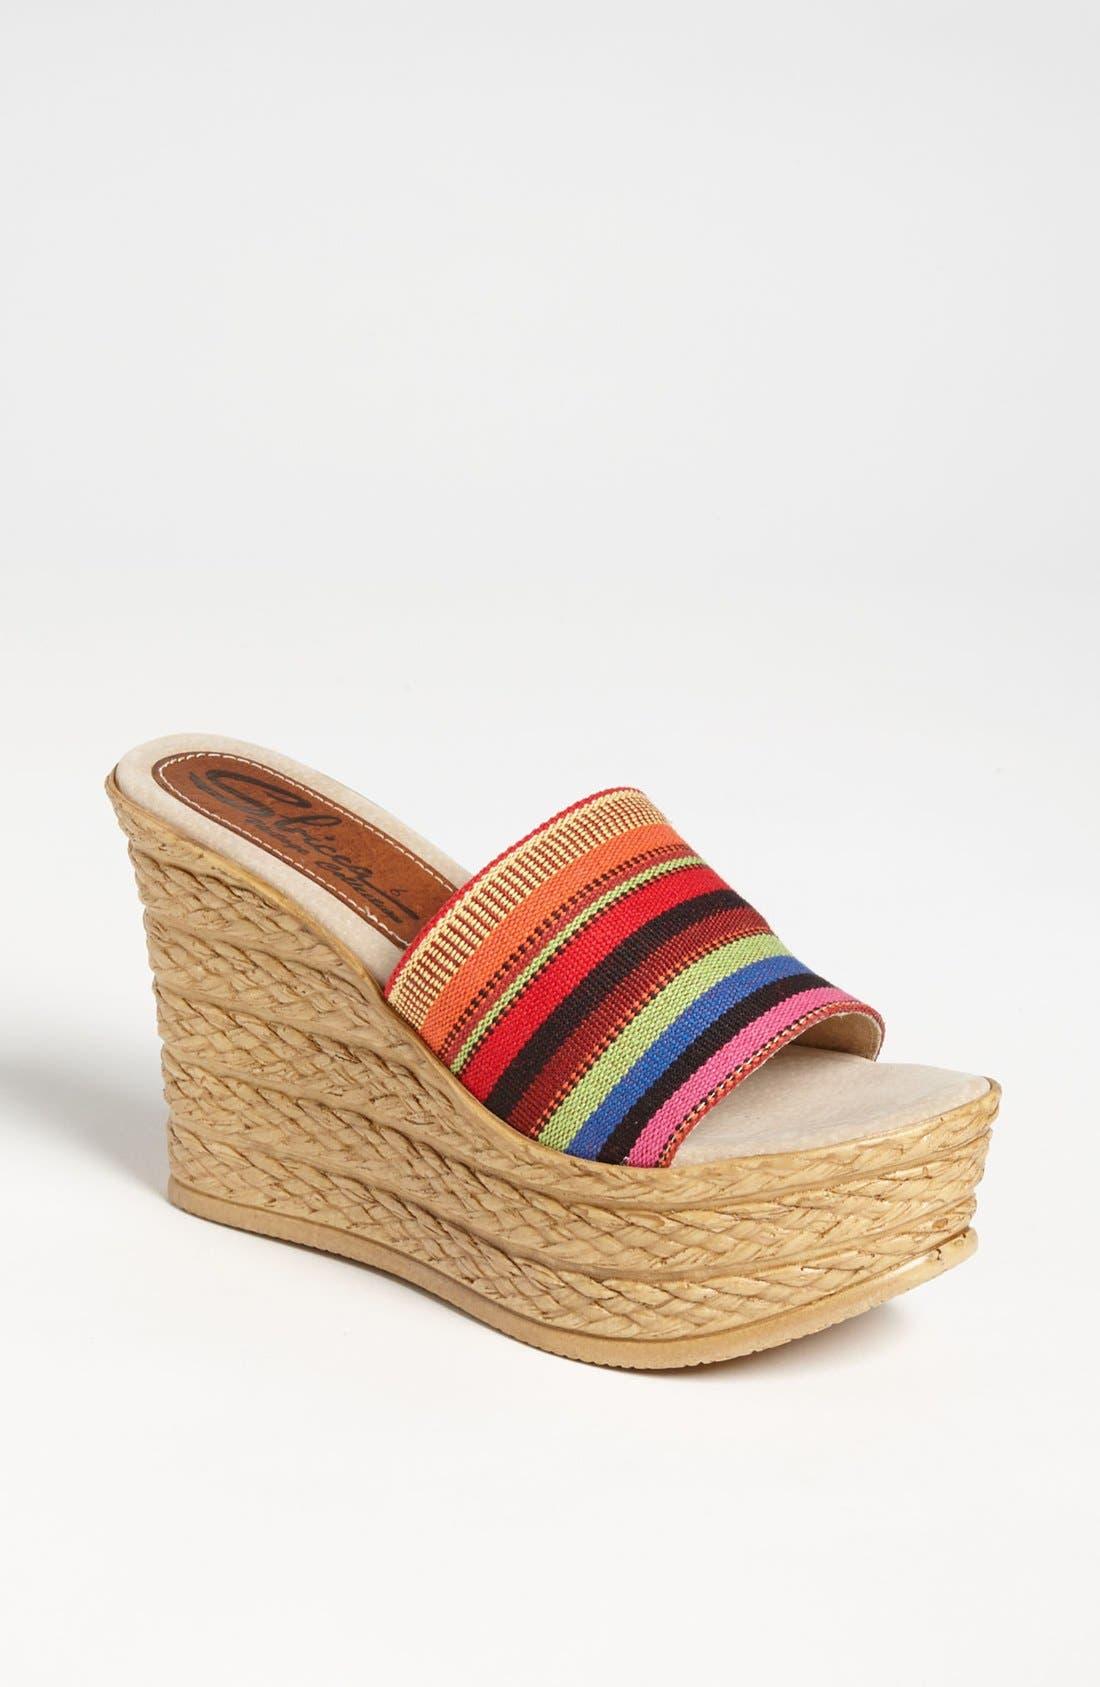 Main Image - Sbicca 'Onelove' Wedge Sandal